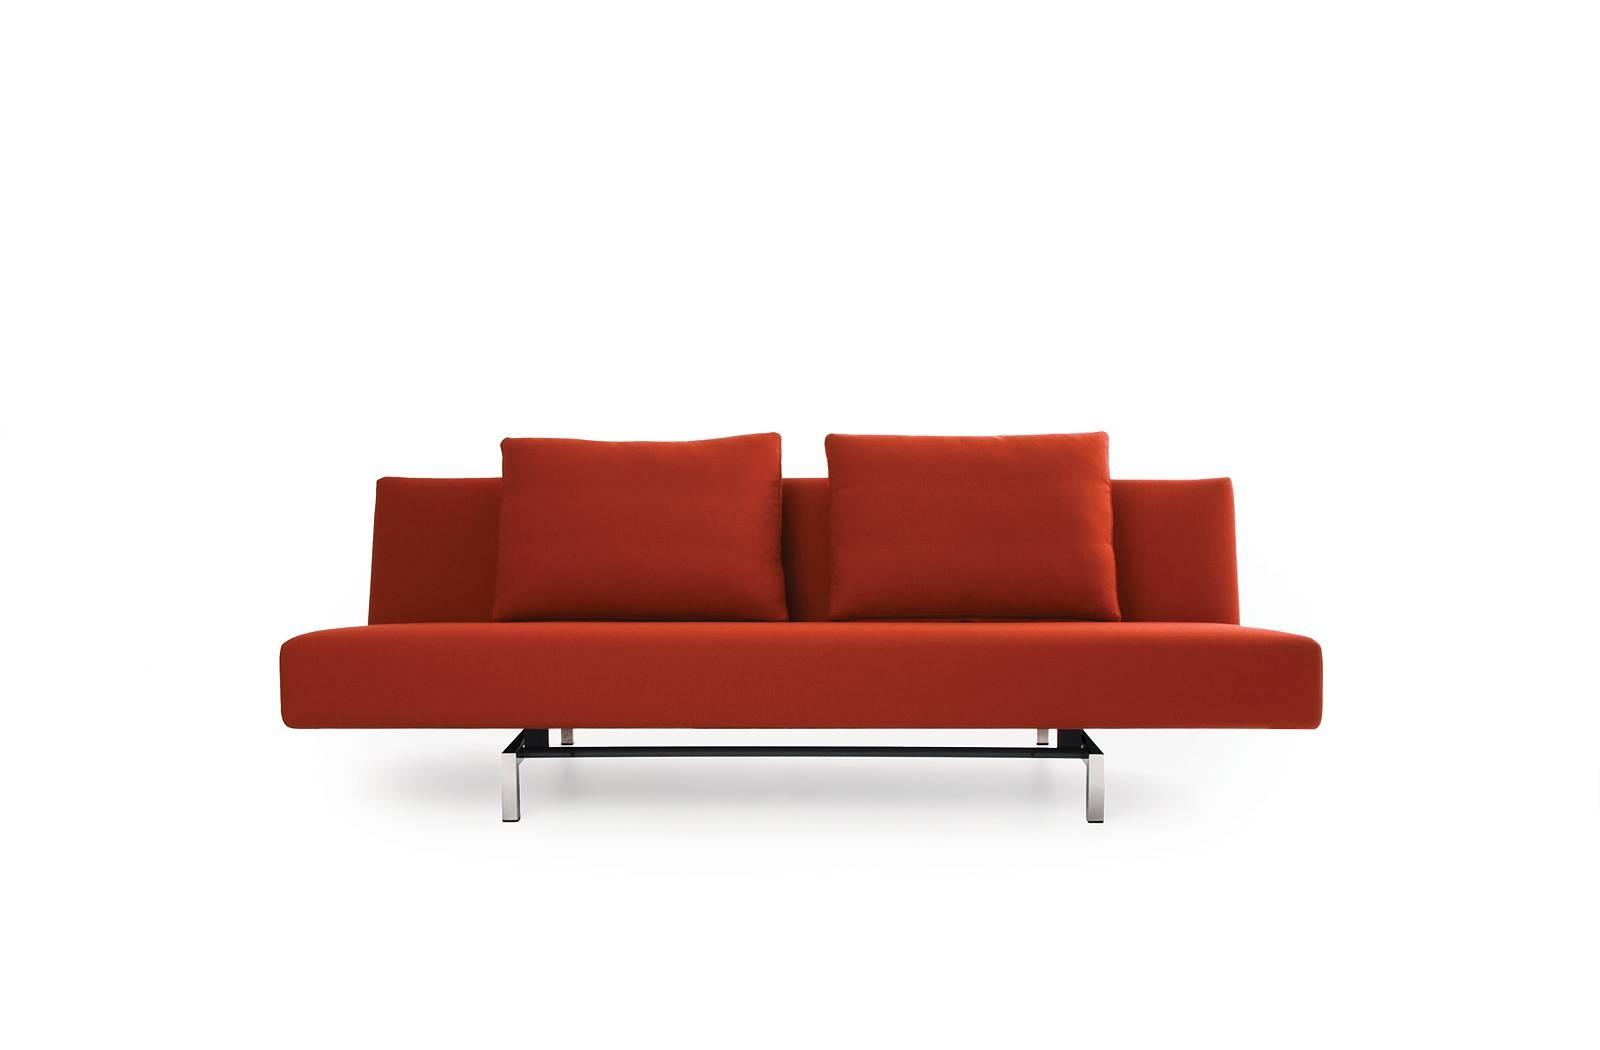 Sleeper | Bensen with regard to Bensen Sofas (Image 15 of 15)